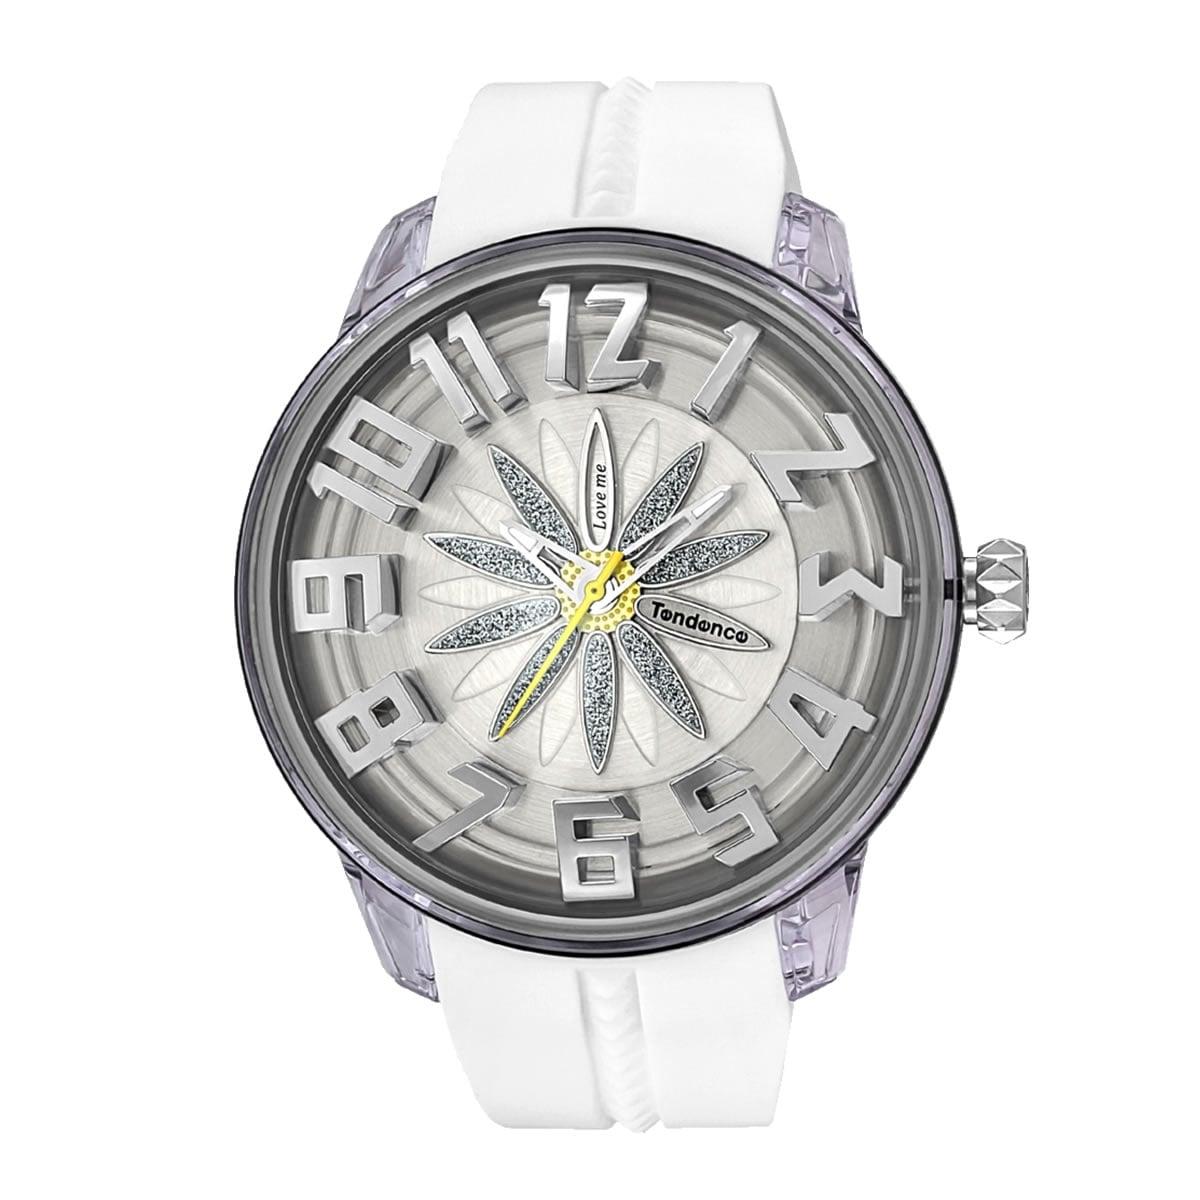 Tendence(テンデンス) King Dome(キングドーム) TY023004 腕時計